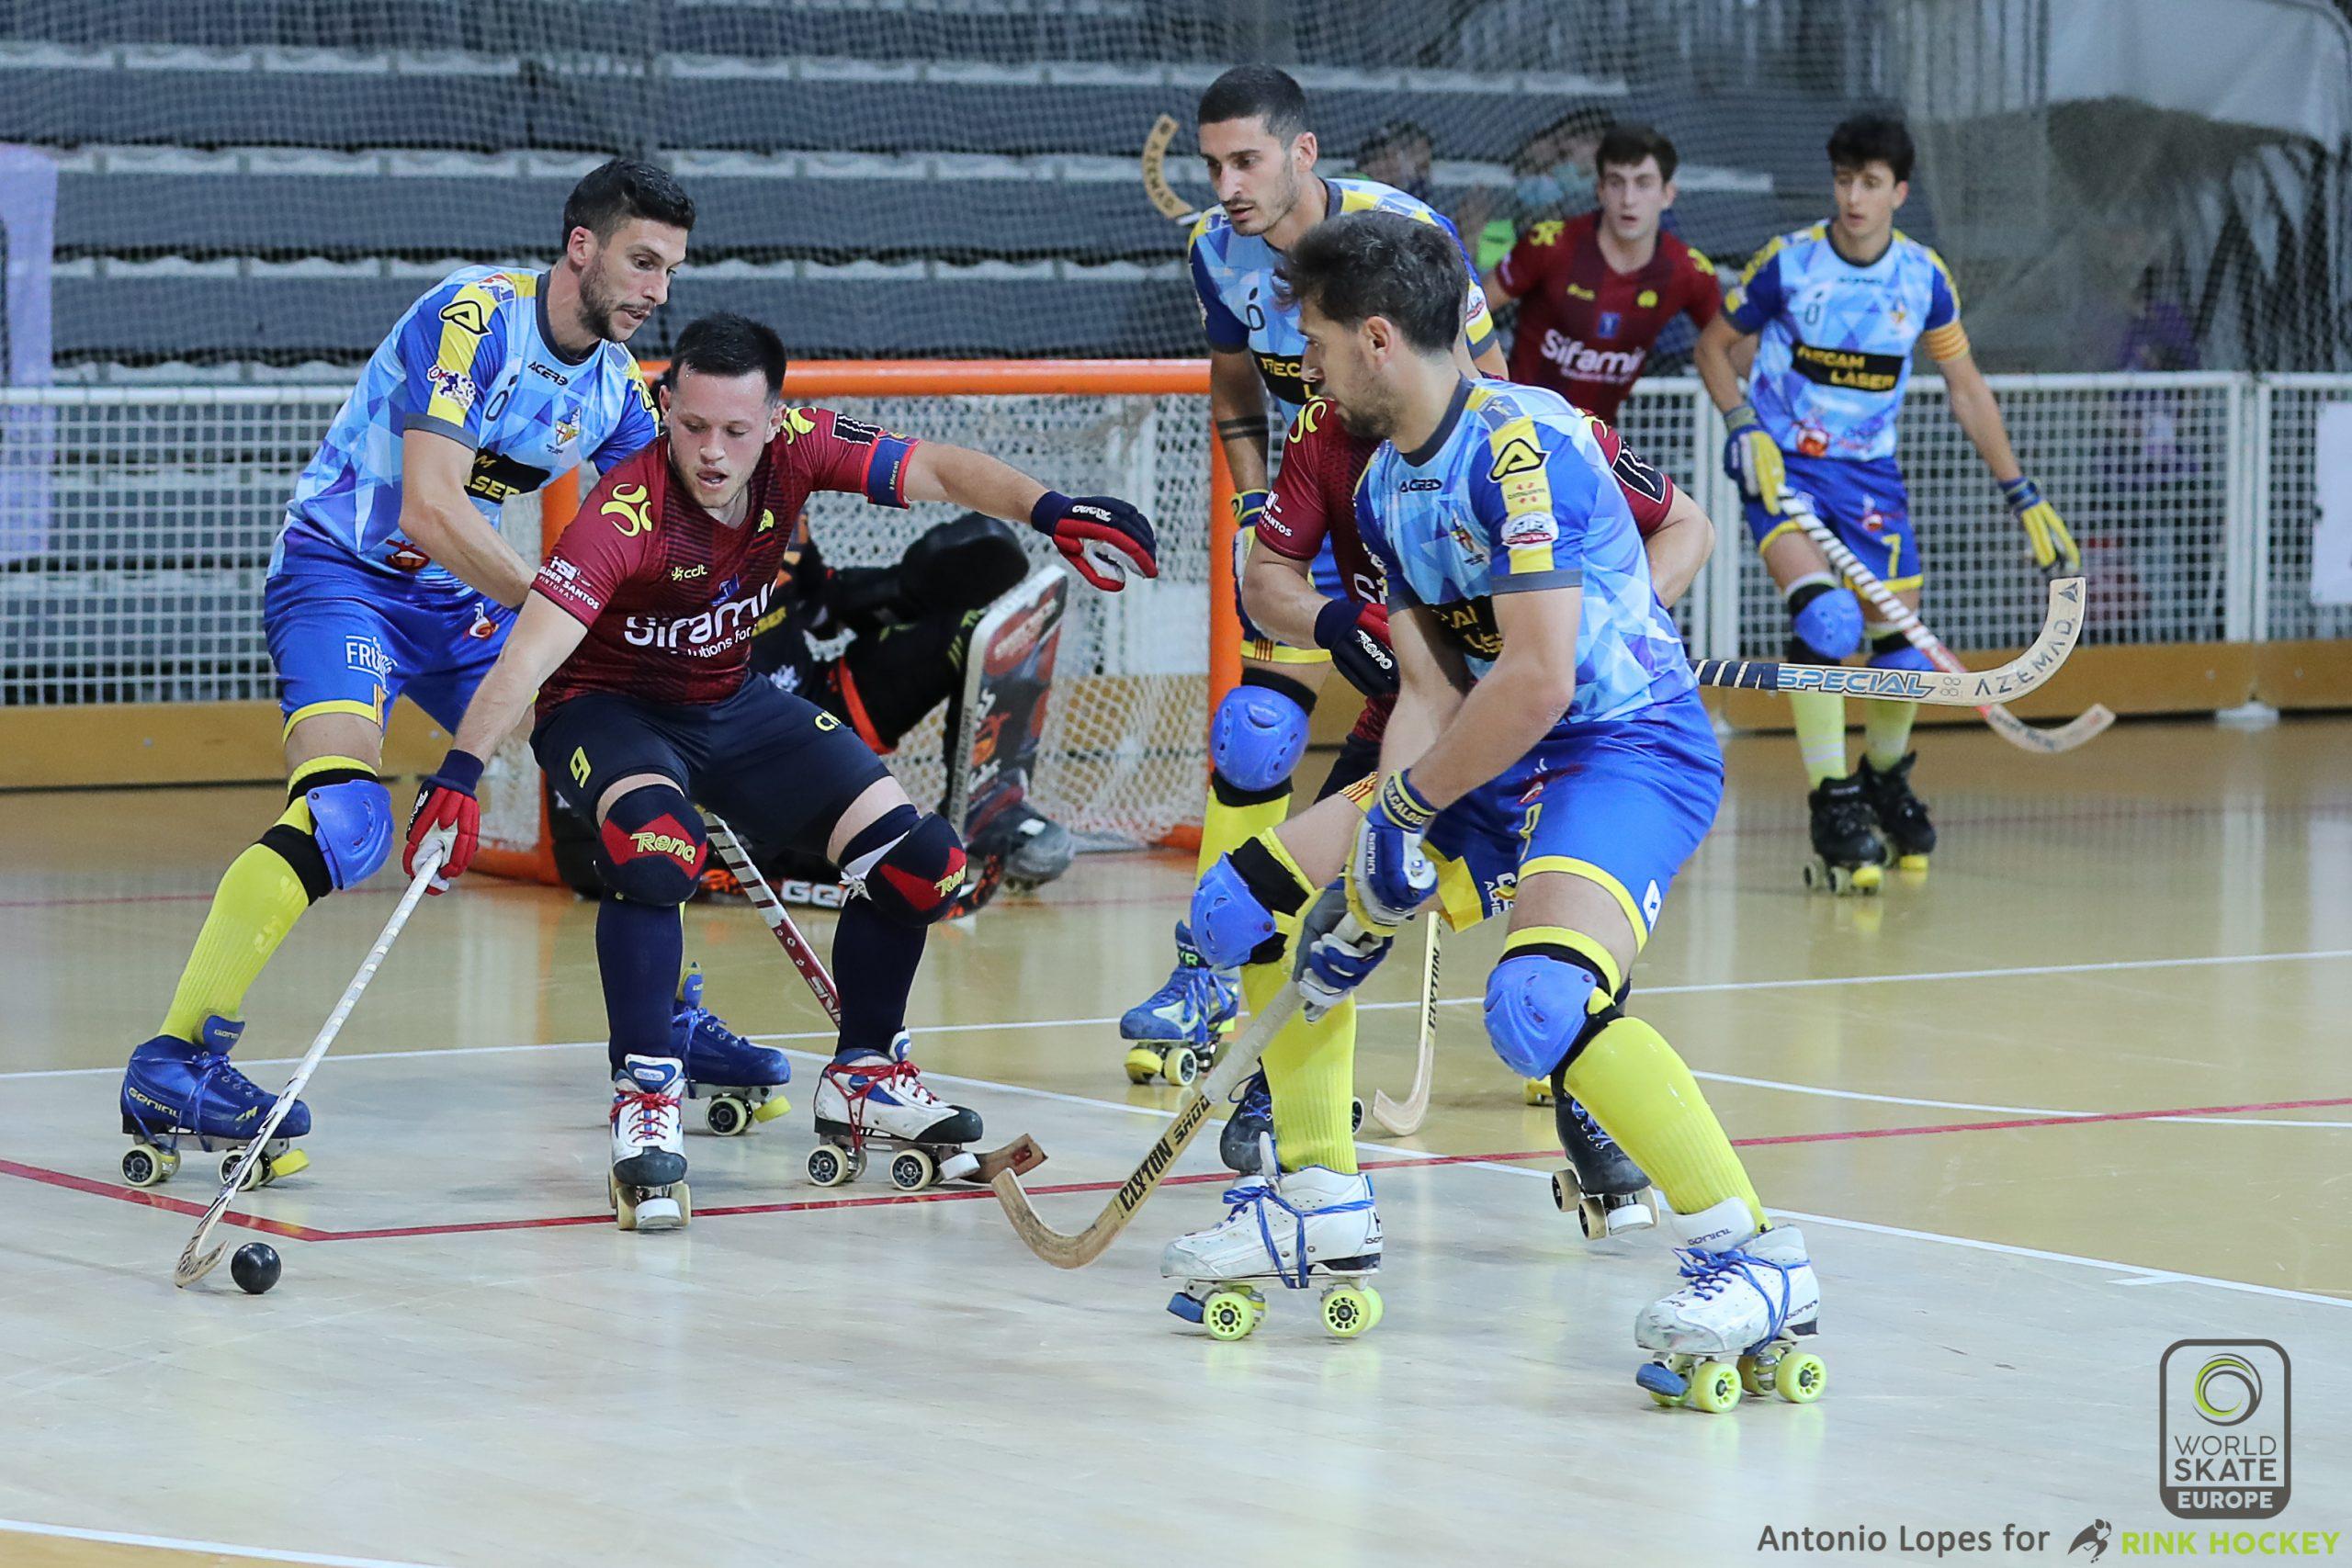 PHOTOS - 18-06-2021 - WS EUROPE CUP - Match #021 - CH Caldes (SP) x Riba D'Ave (PT)